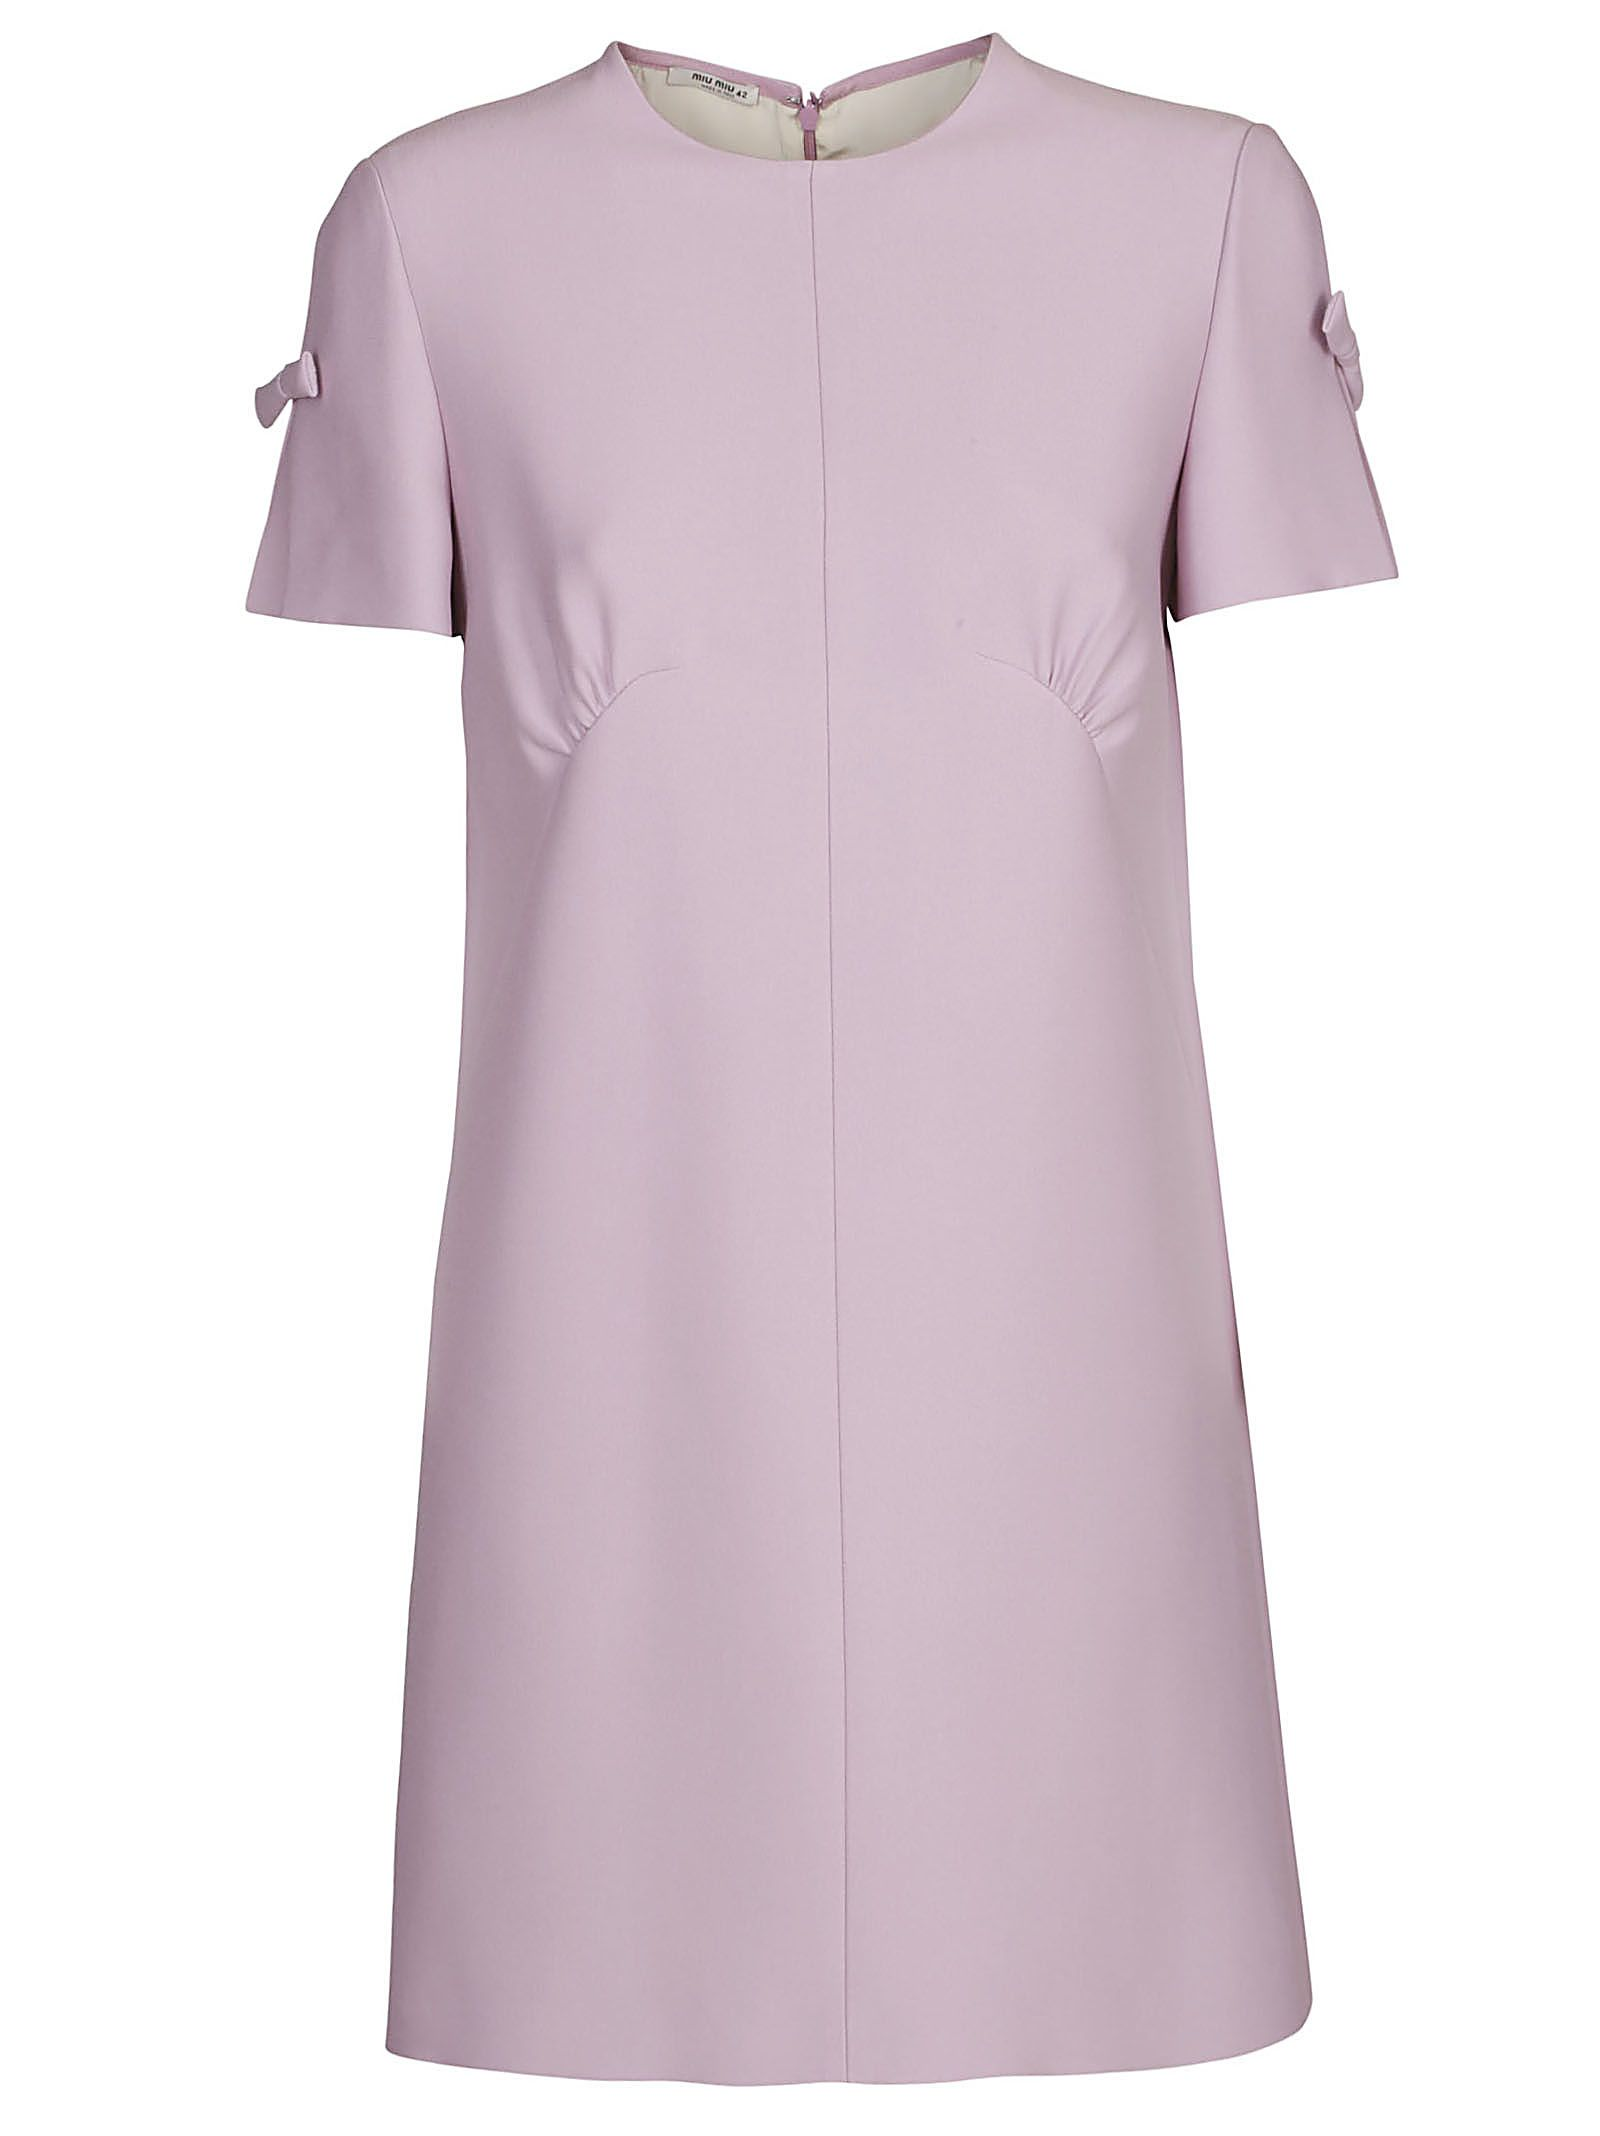 Miu Miu Side Sleeve Applique Dress